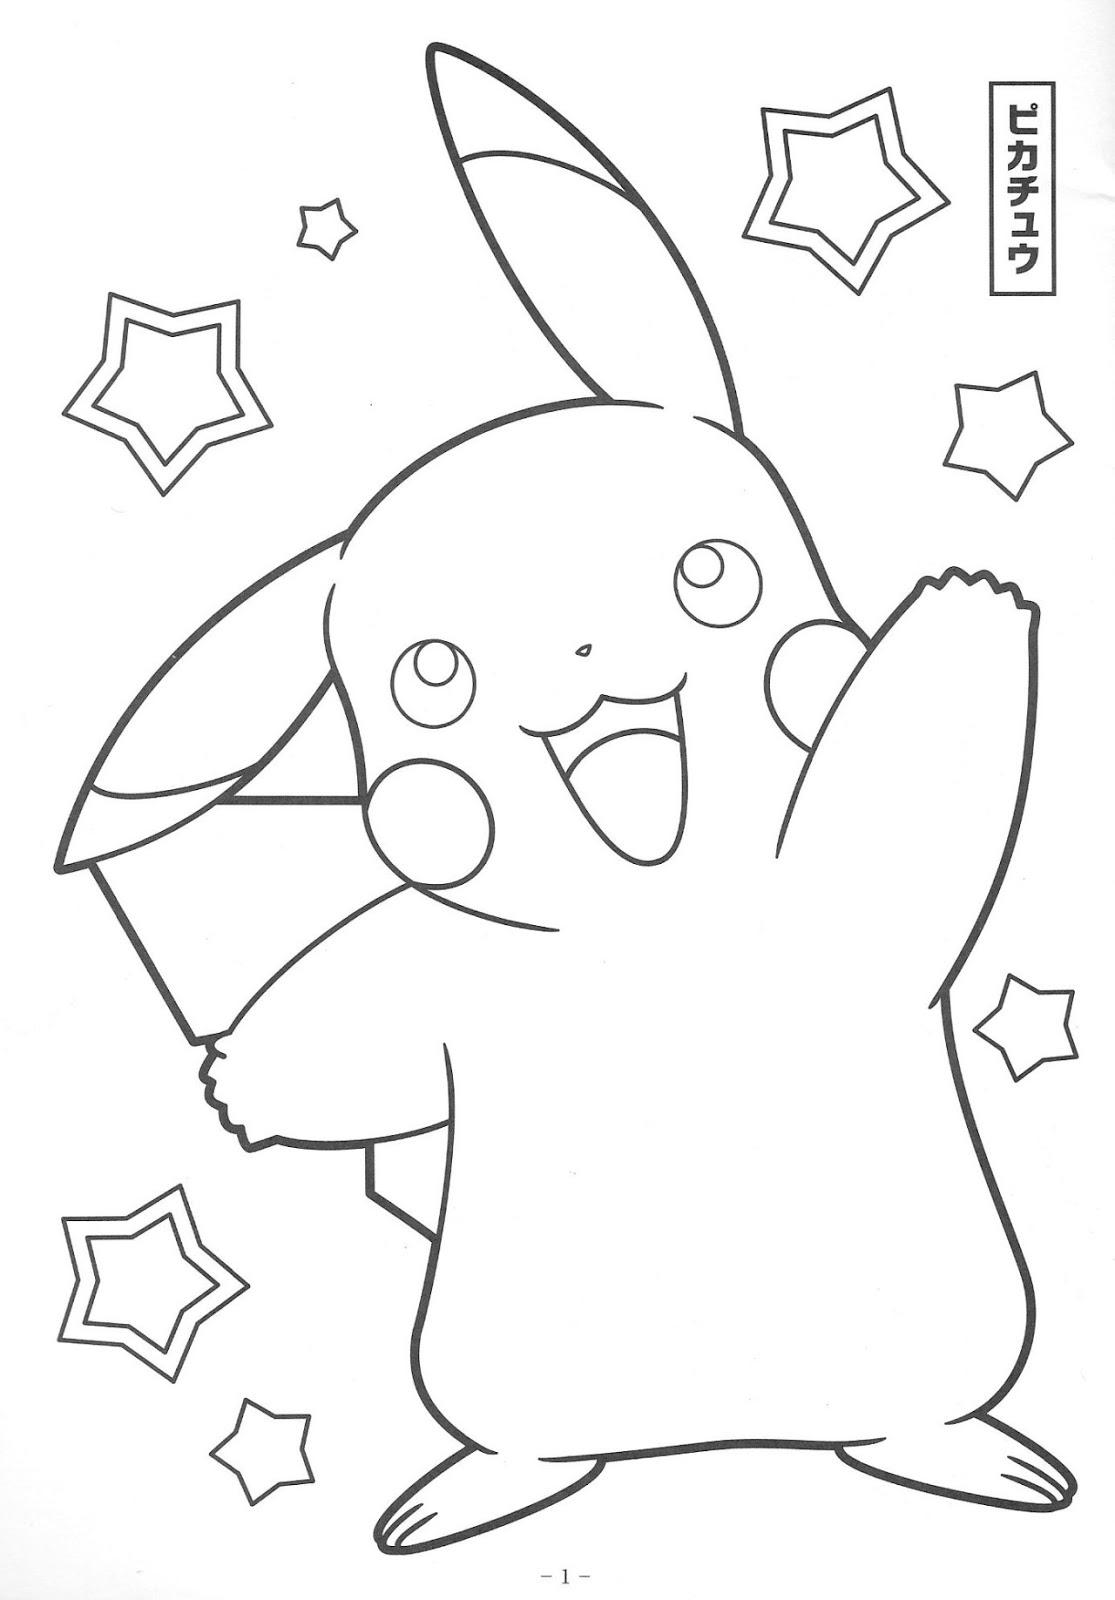 Imagens De Pokemons Para Colorir